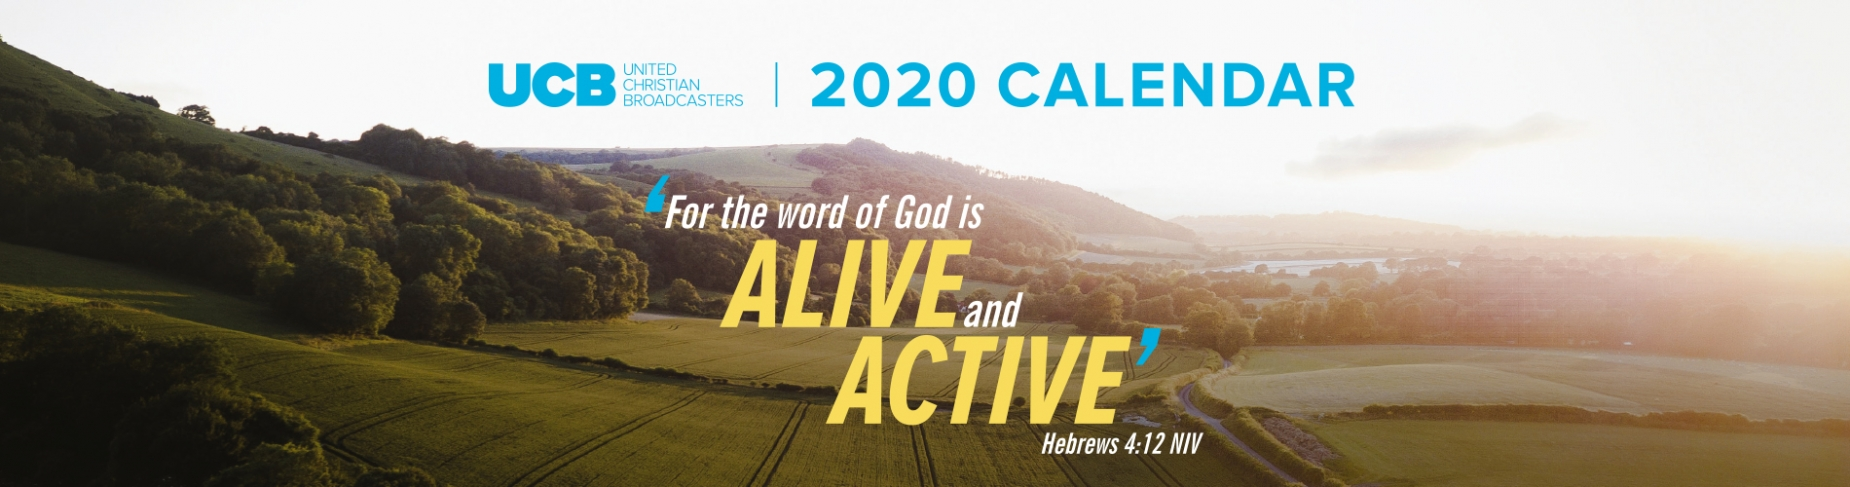 UCB Calendar 2020